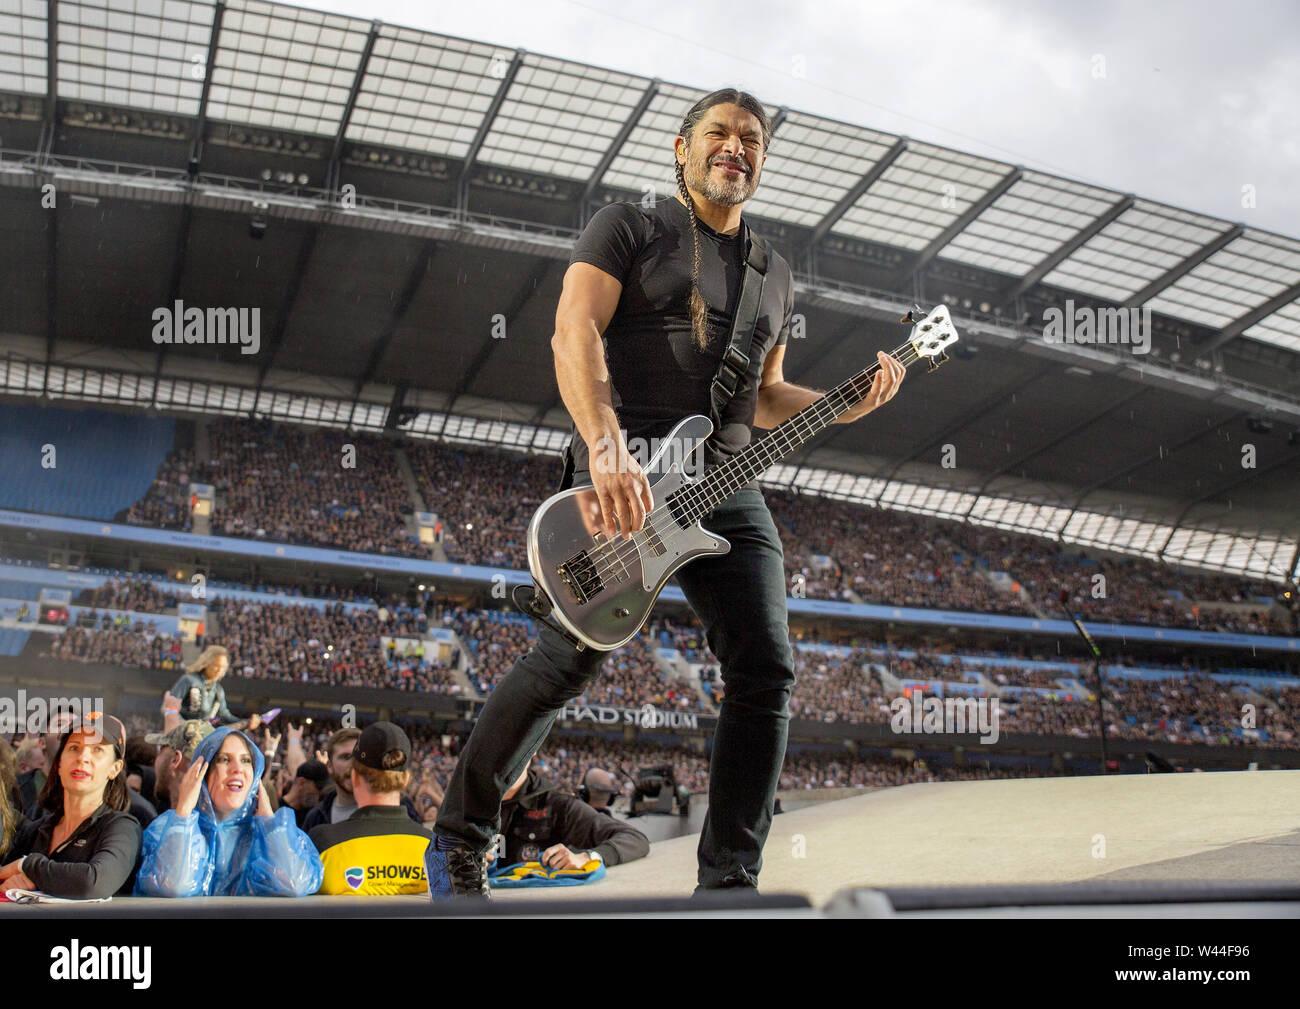 Metallica Performing On Their Worldwired Tour 2019 at Manchester Etihad Stadium Featuring: Metallica, Robert Trujillo Where: Manchester, United Kingdom When: 18 Jun 2019 Credit: Sakura/WENN.com - Stock Image